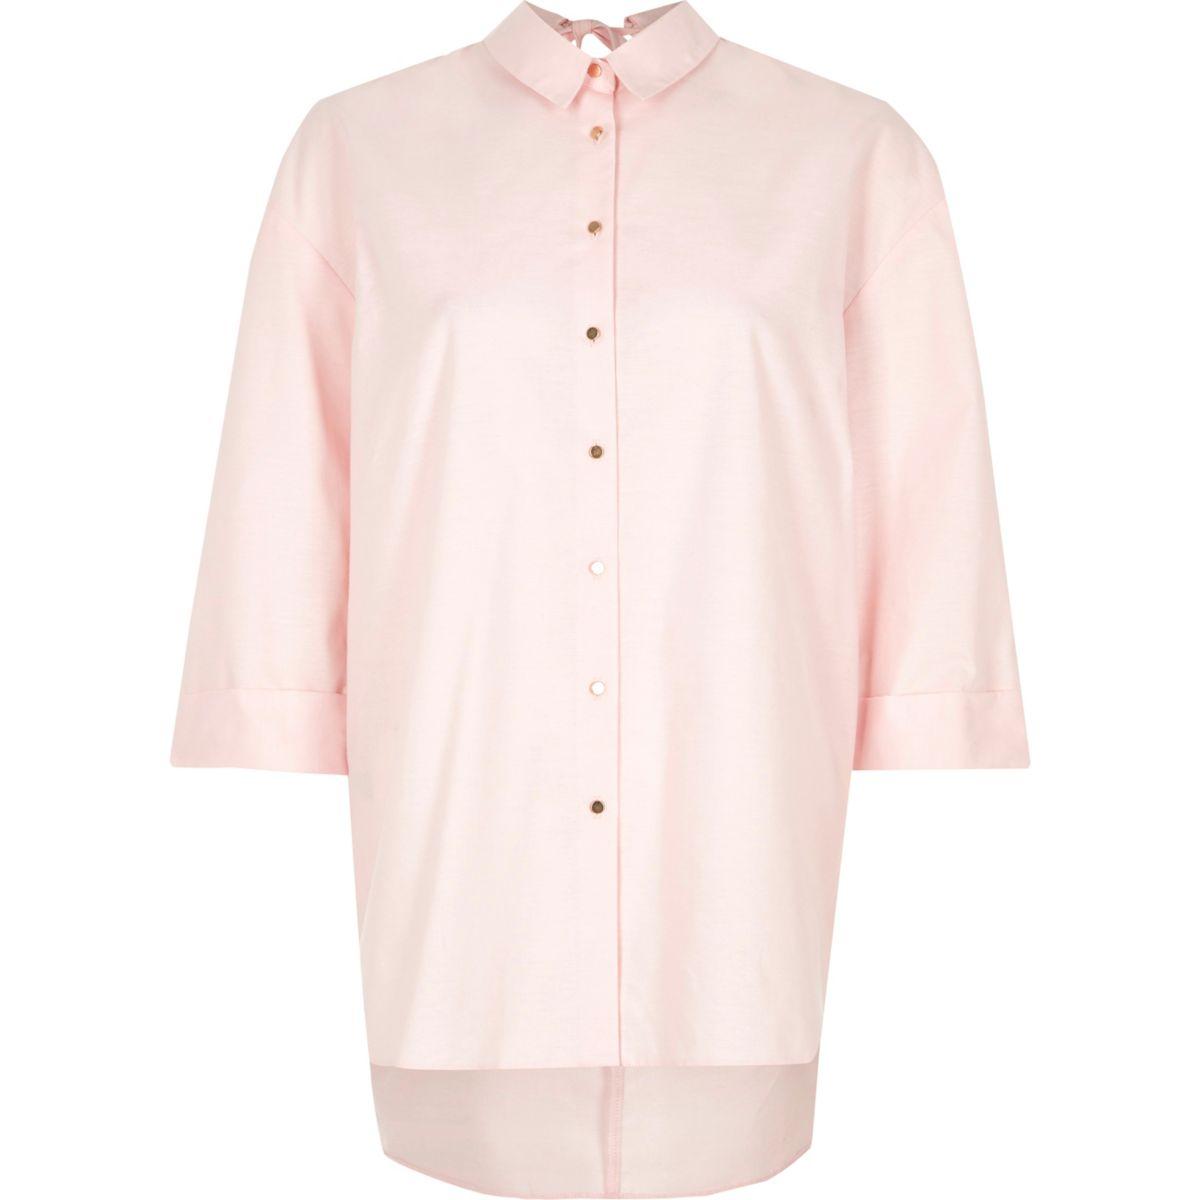 Pink open back oversized shirt